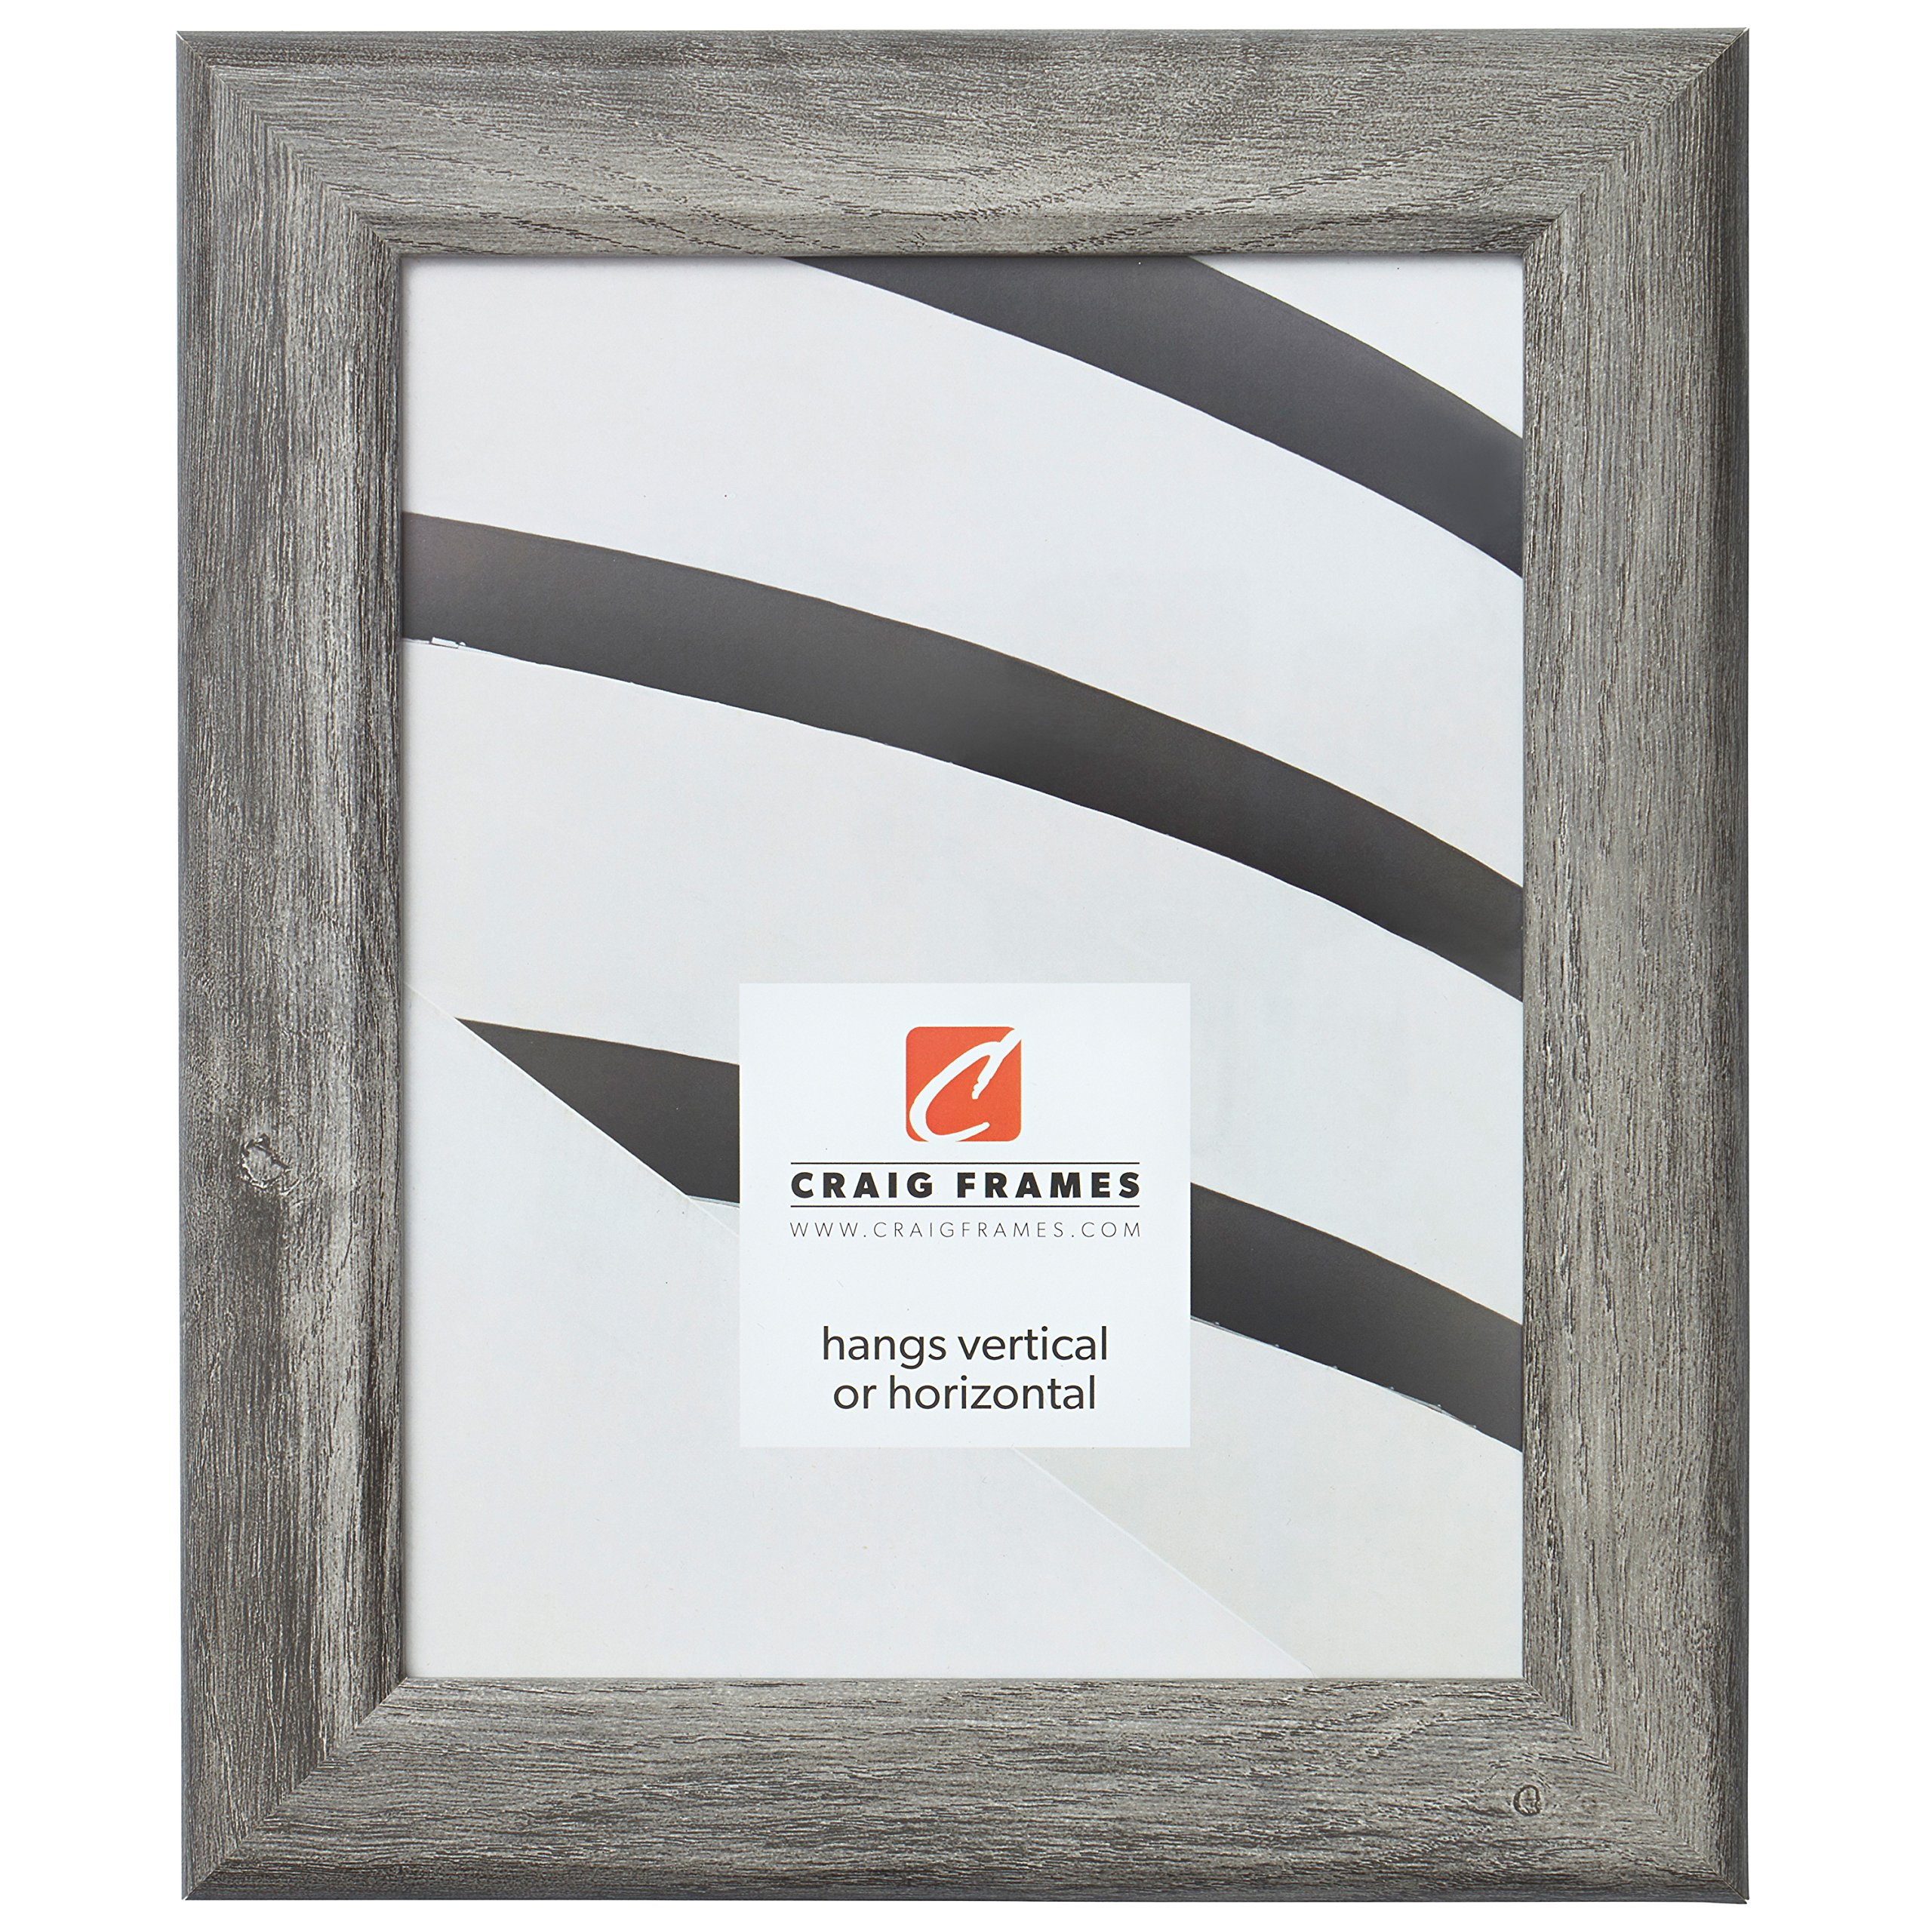 Craig Frames Arthur Picture Frame, 16 x 20 Inch, Gray Barnwood by Craig Frames